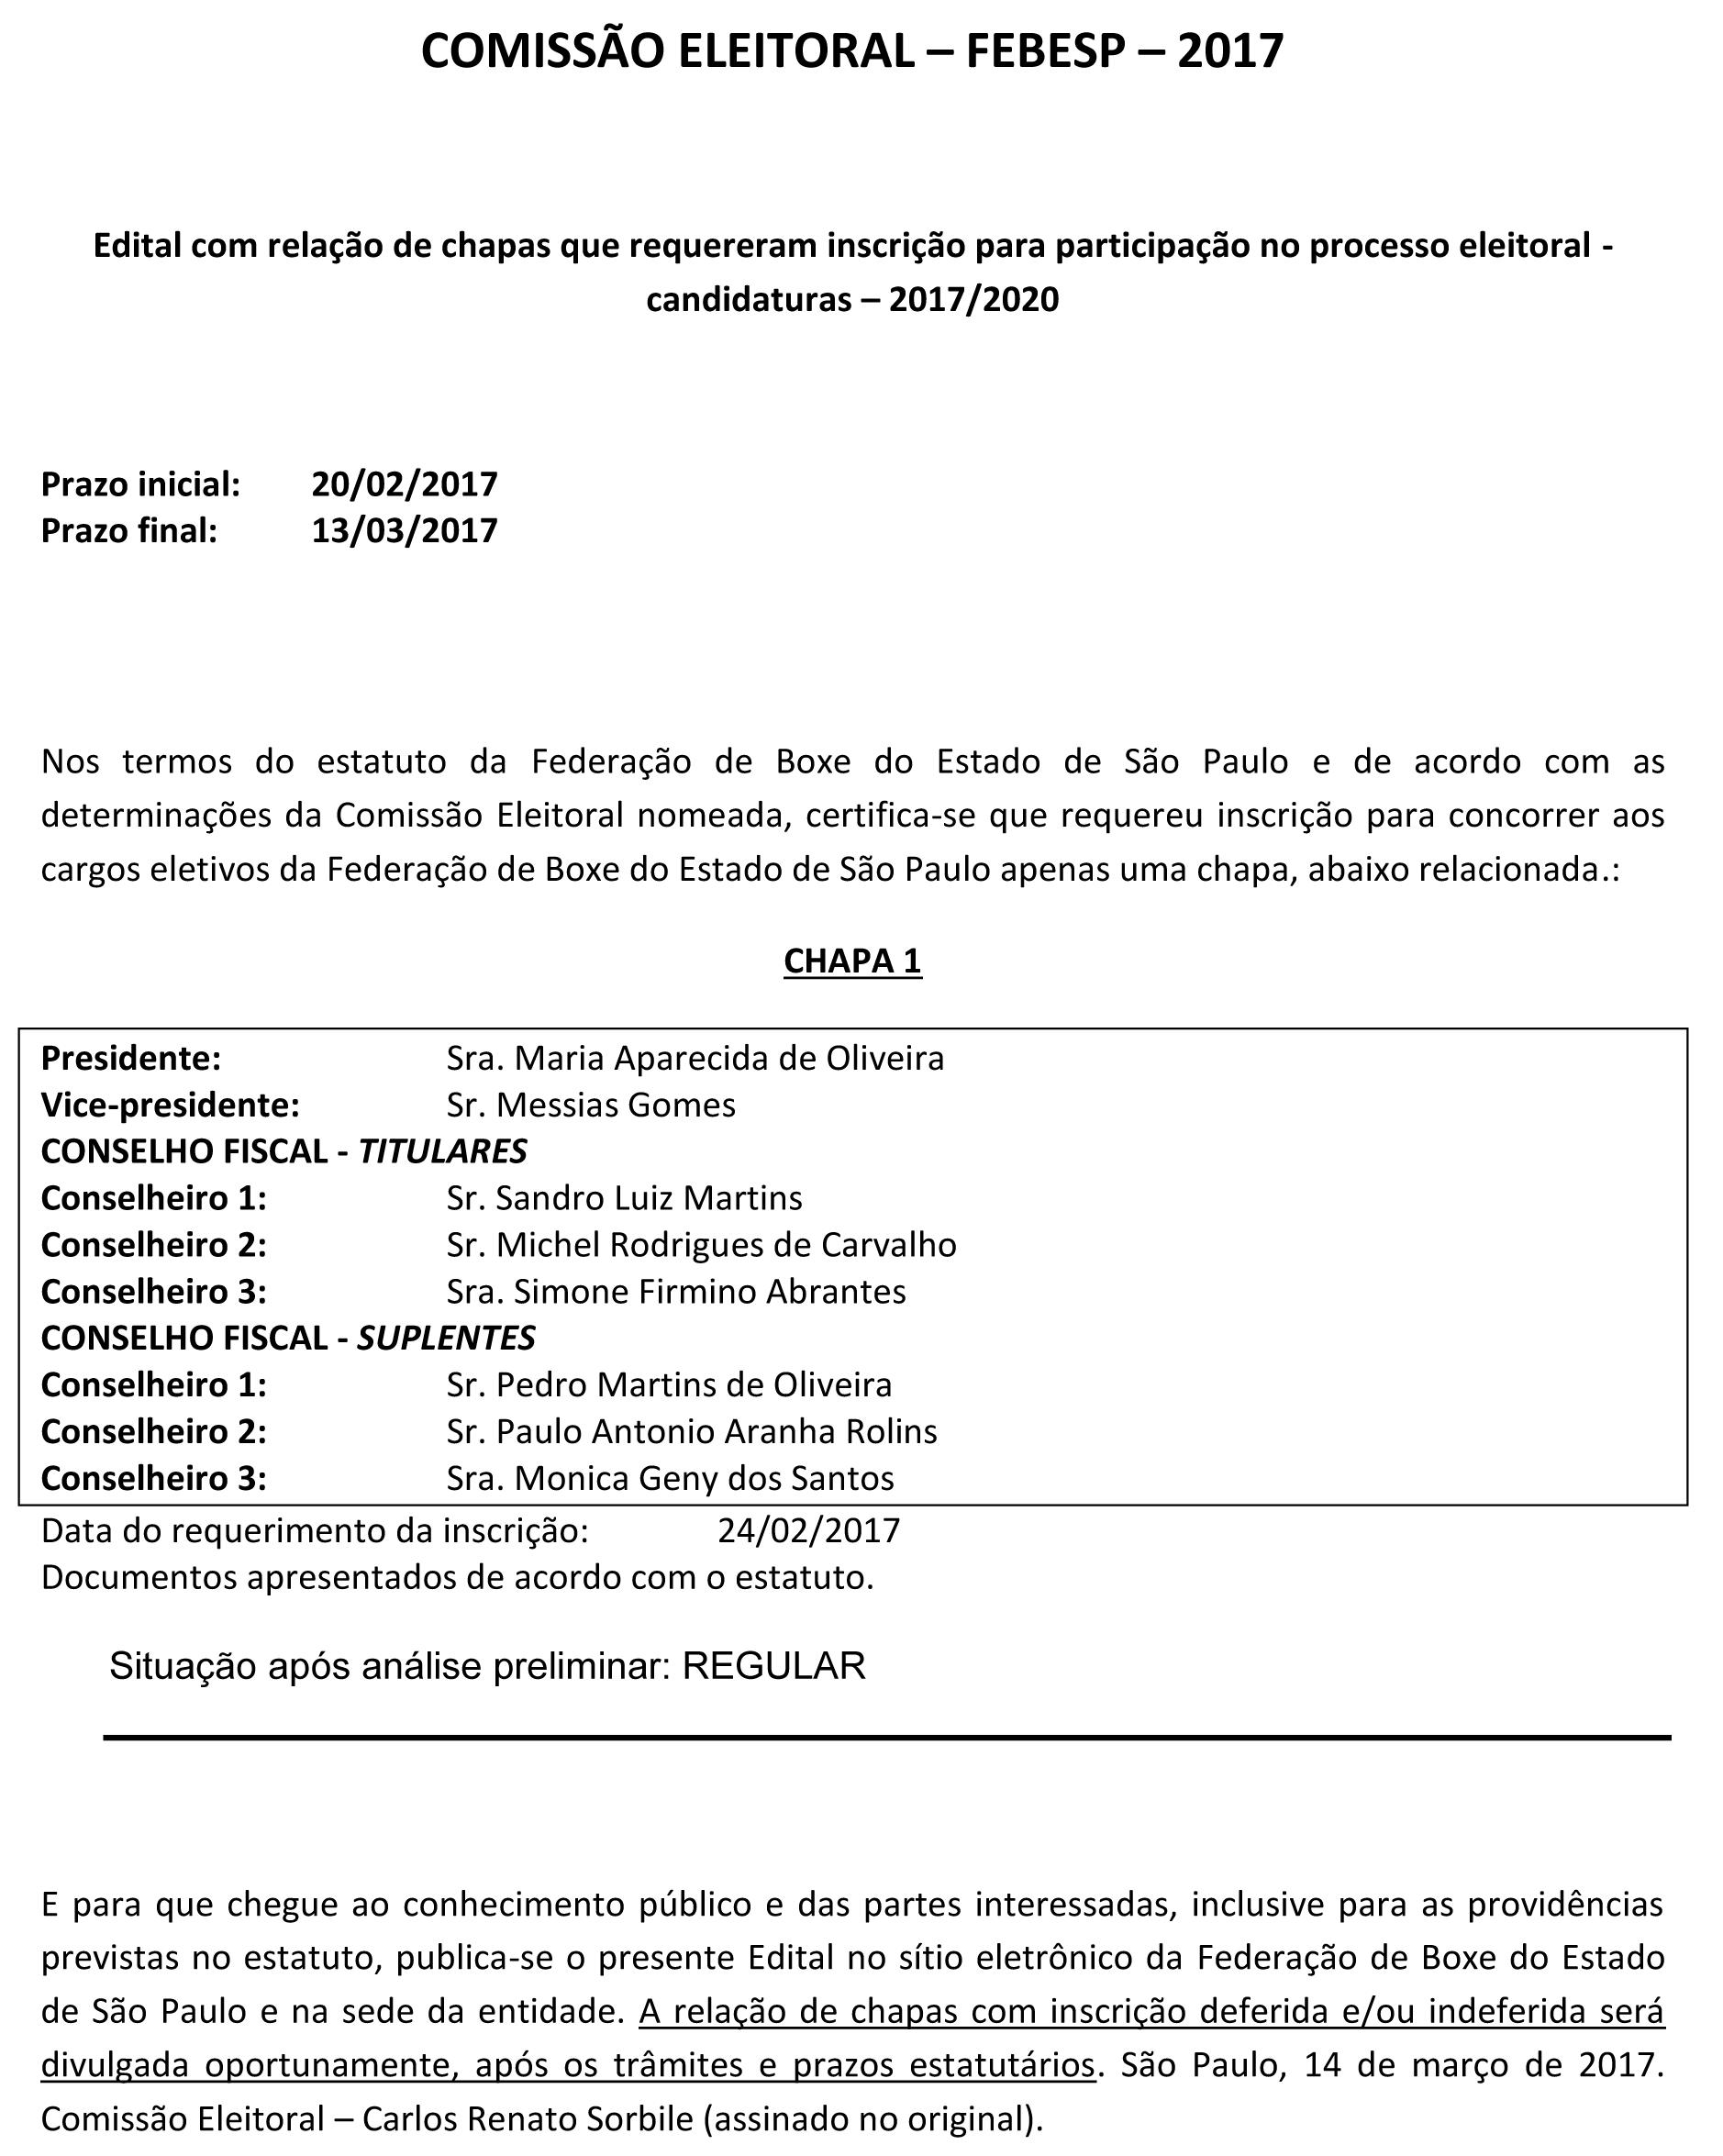 FEBESP-RELACAO-DE-CHAPA-INSCRITA